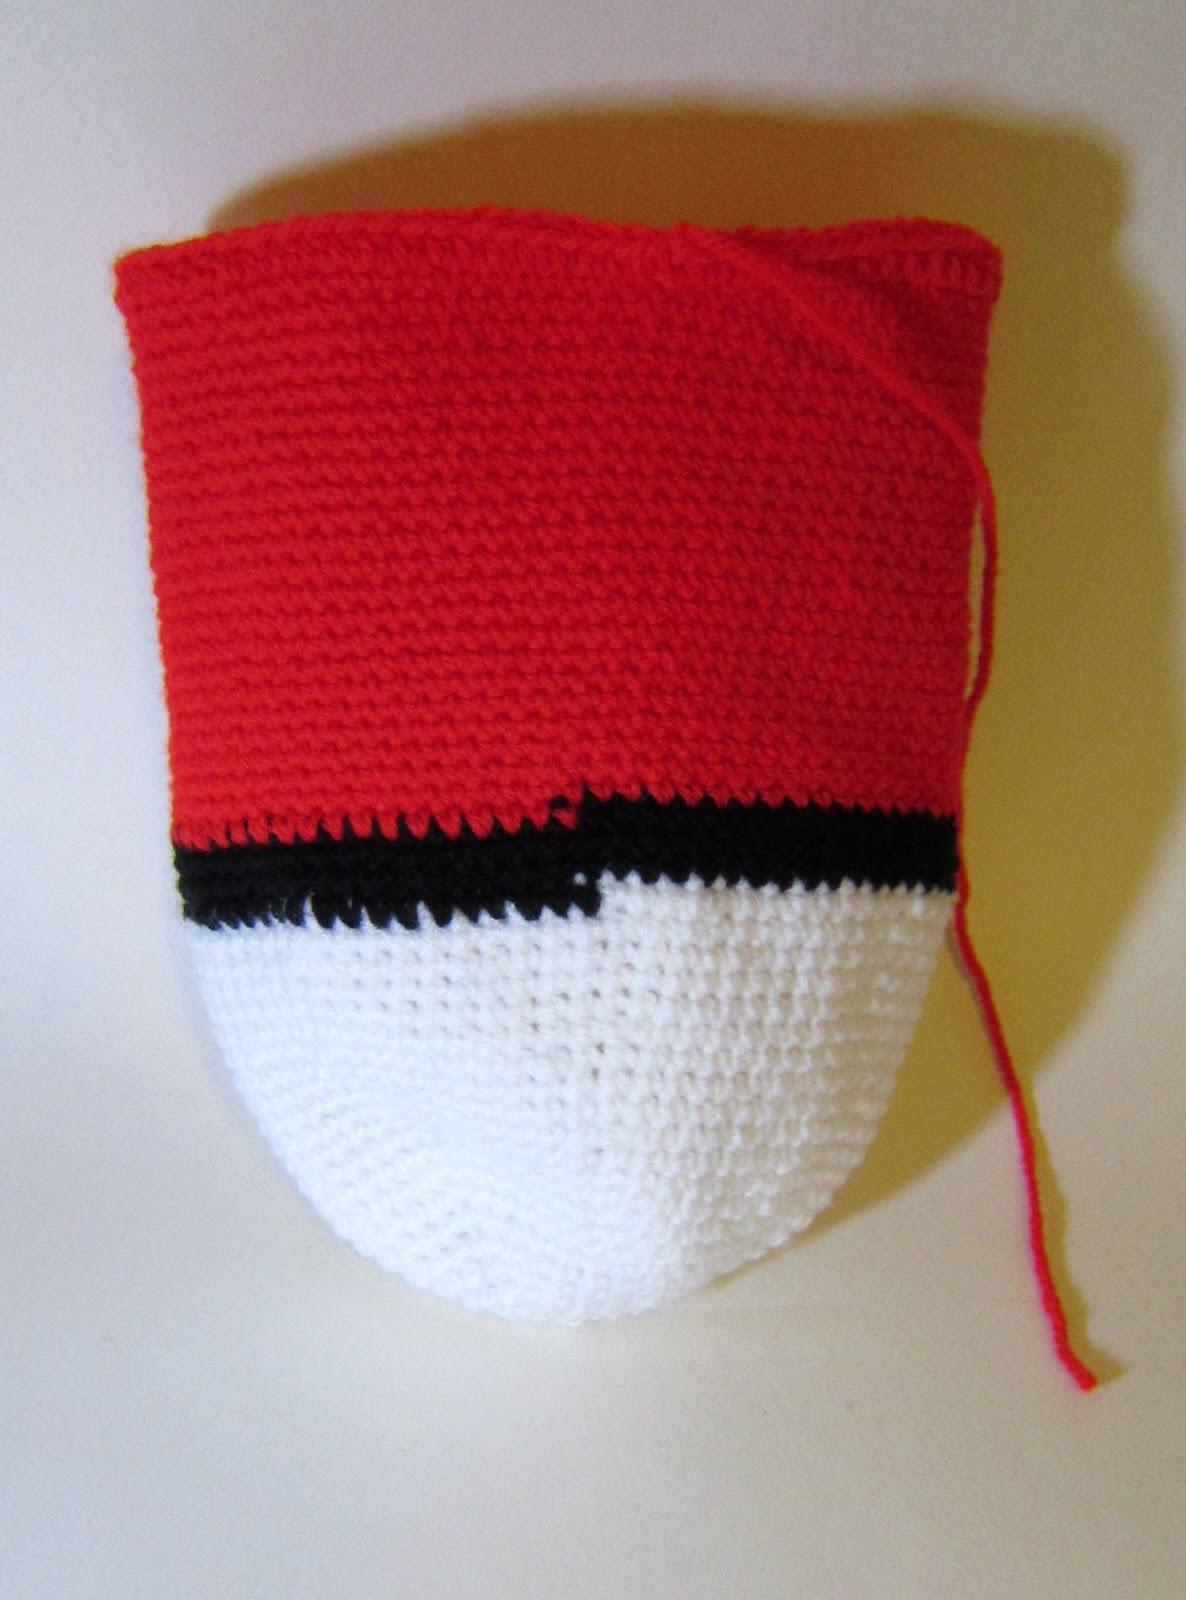 Drawn pokeball yarn Incy Crochet x sc Round